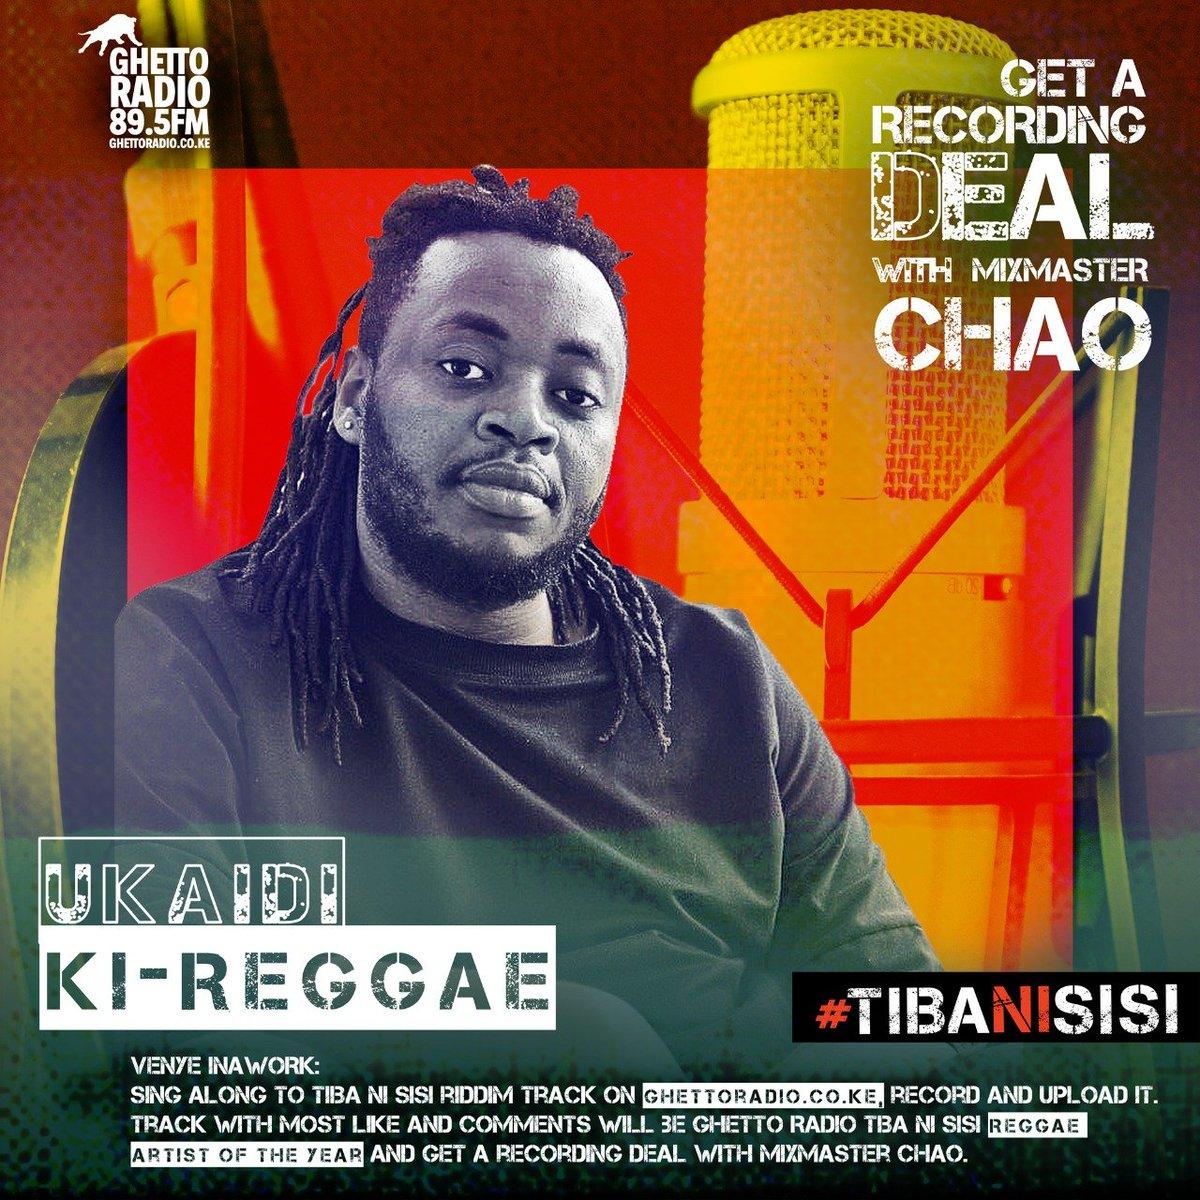 Wewe ni Shatta pande ya Reggae!? Tunasaka Reggae artist courtesy @TibaNiSisi riddim, record sample moja simple ukitumia #TibaNiSisi instrumentals, tag us on social media unaweza angukia Recording Deal matata!!! #Goteana Get #TibaNiSisi instrumentals here>>soundcloud.com/ghetto-radio-8